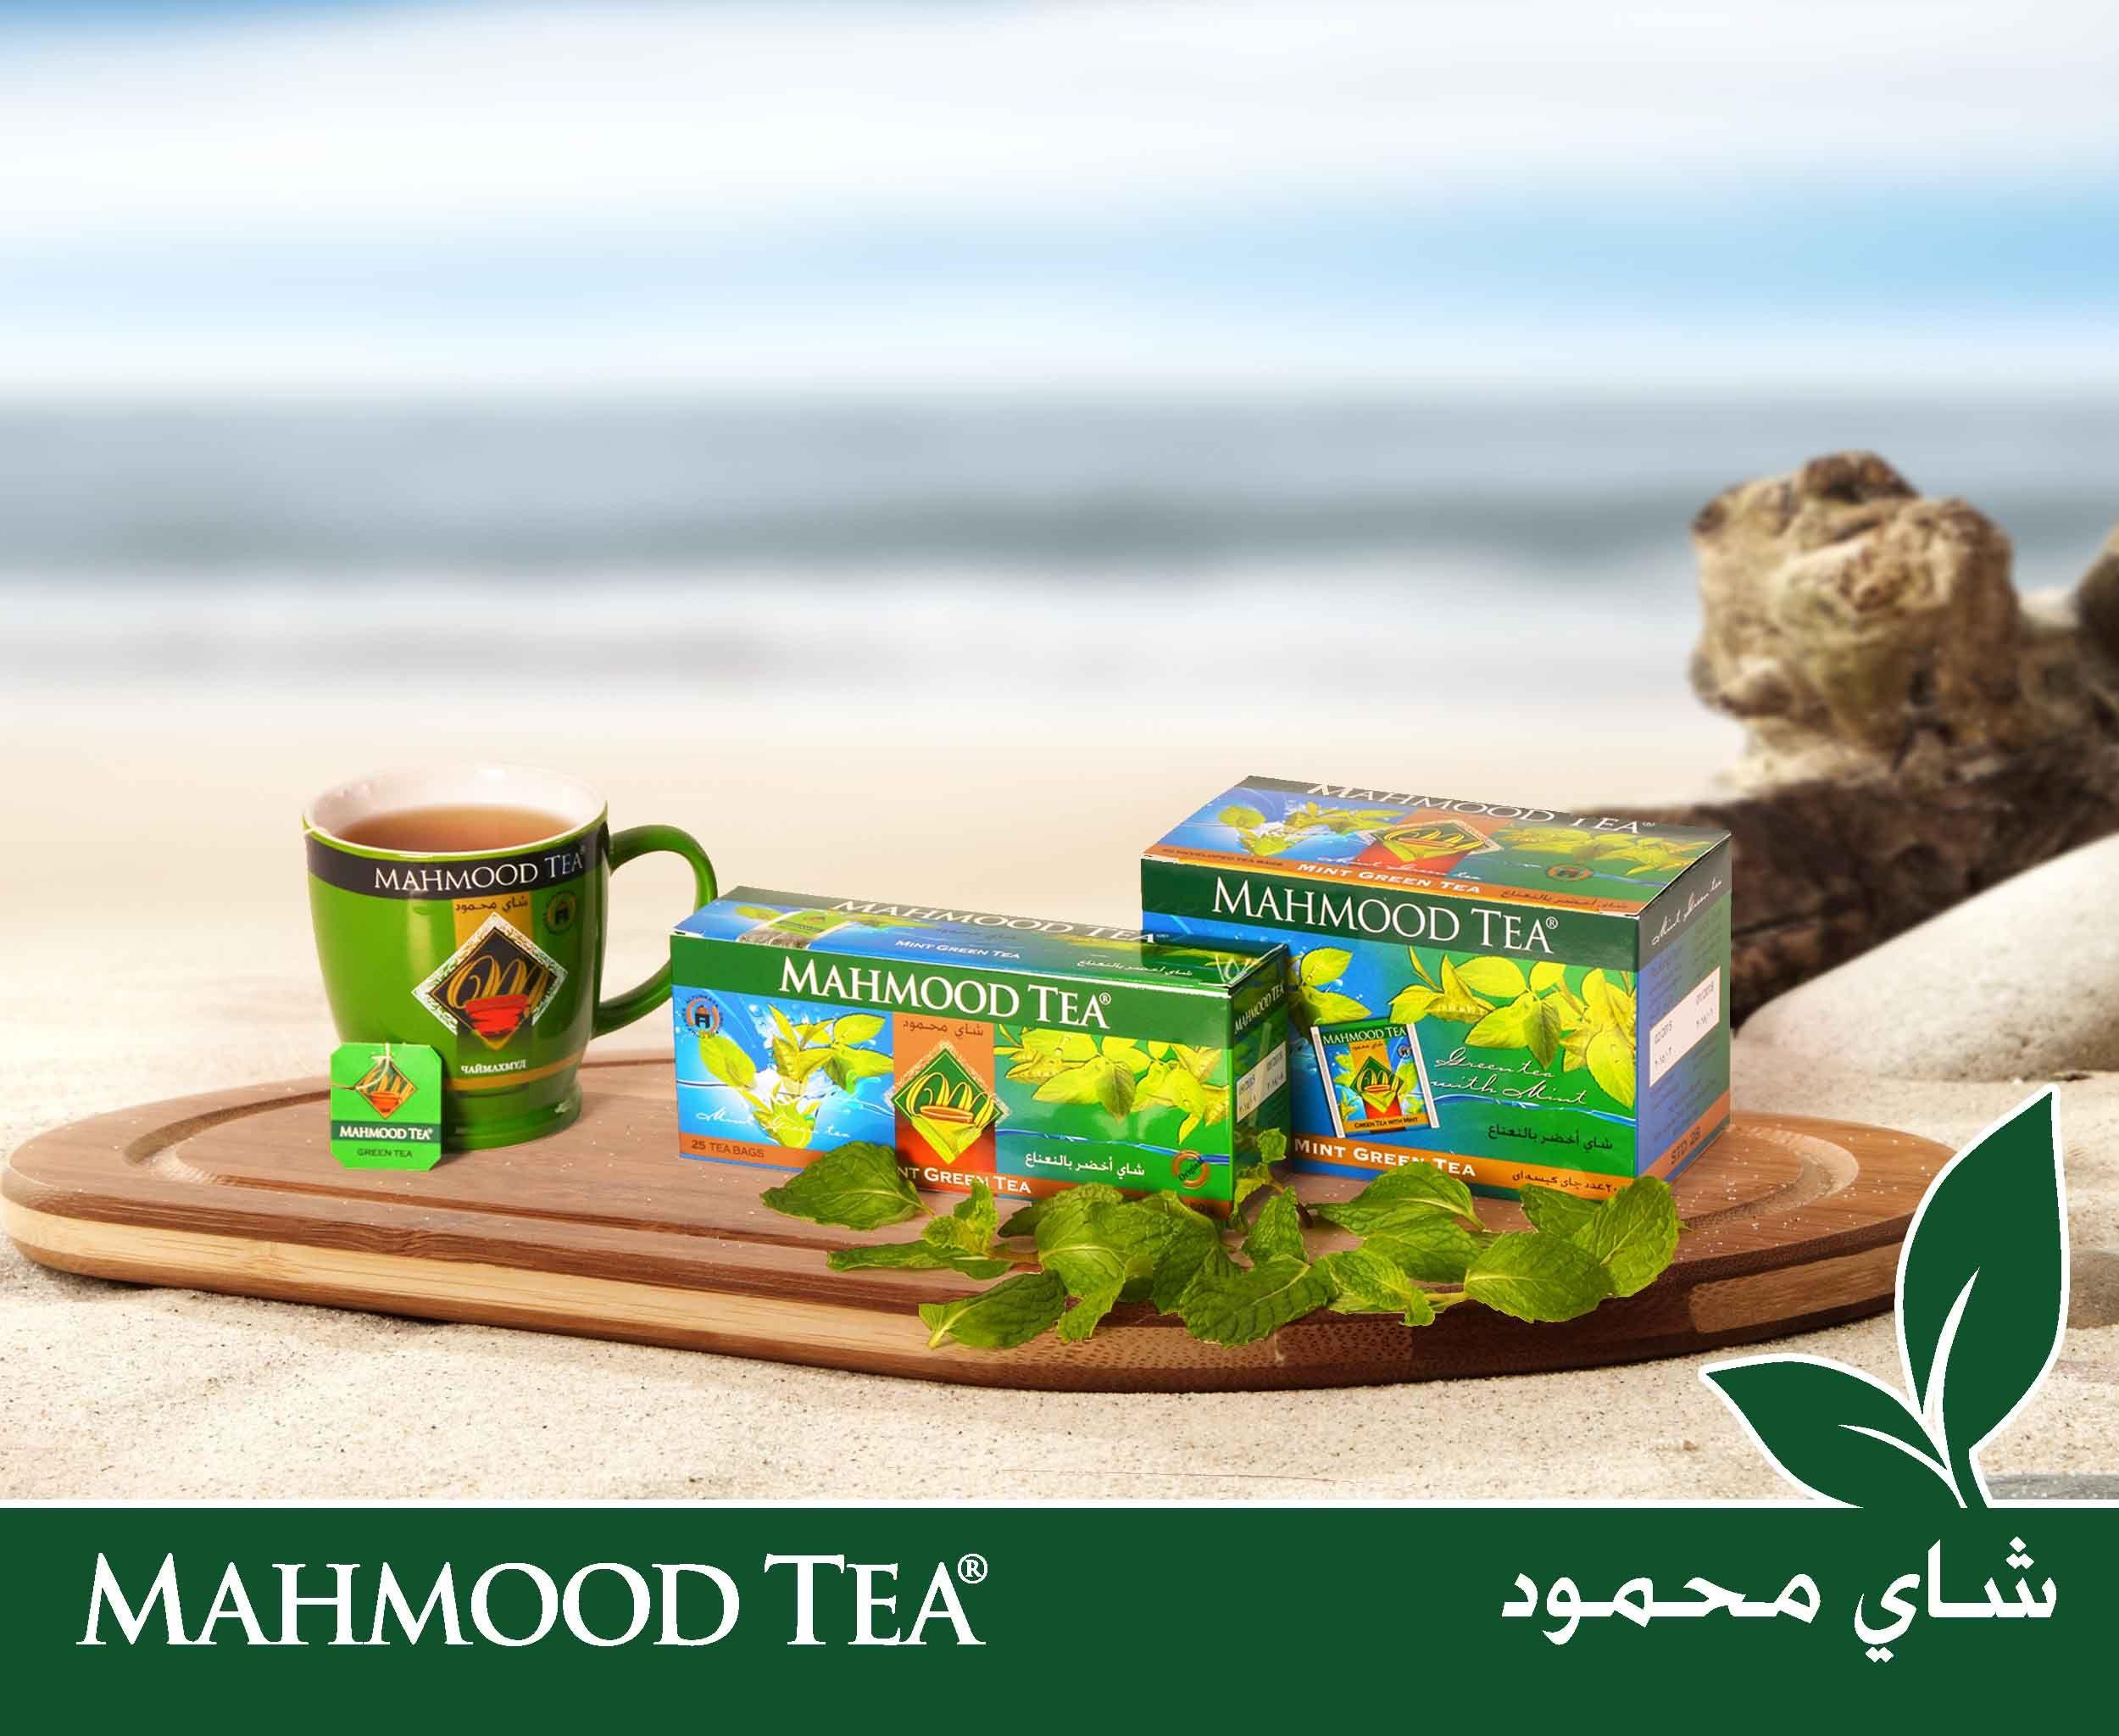 Mahmood Mint Green Tea Mahmoodtea Mintgreentea Greentea شاي أخضر بالنعناع